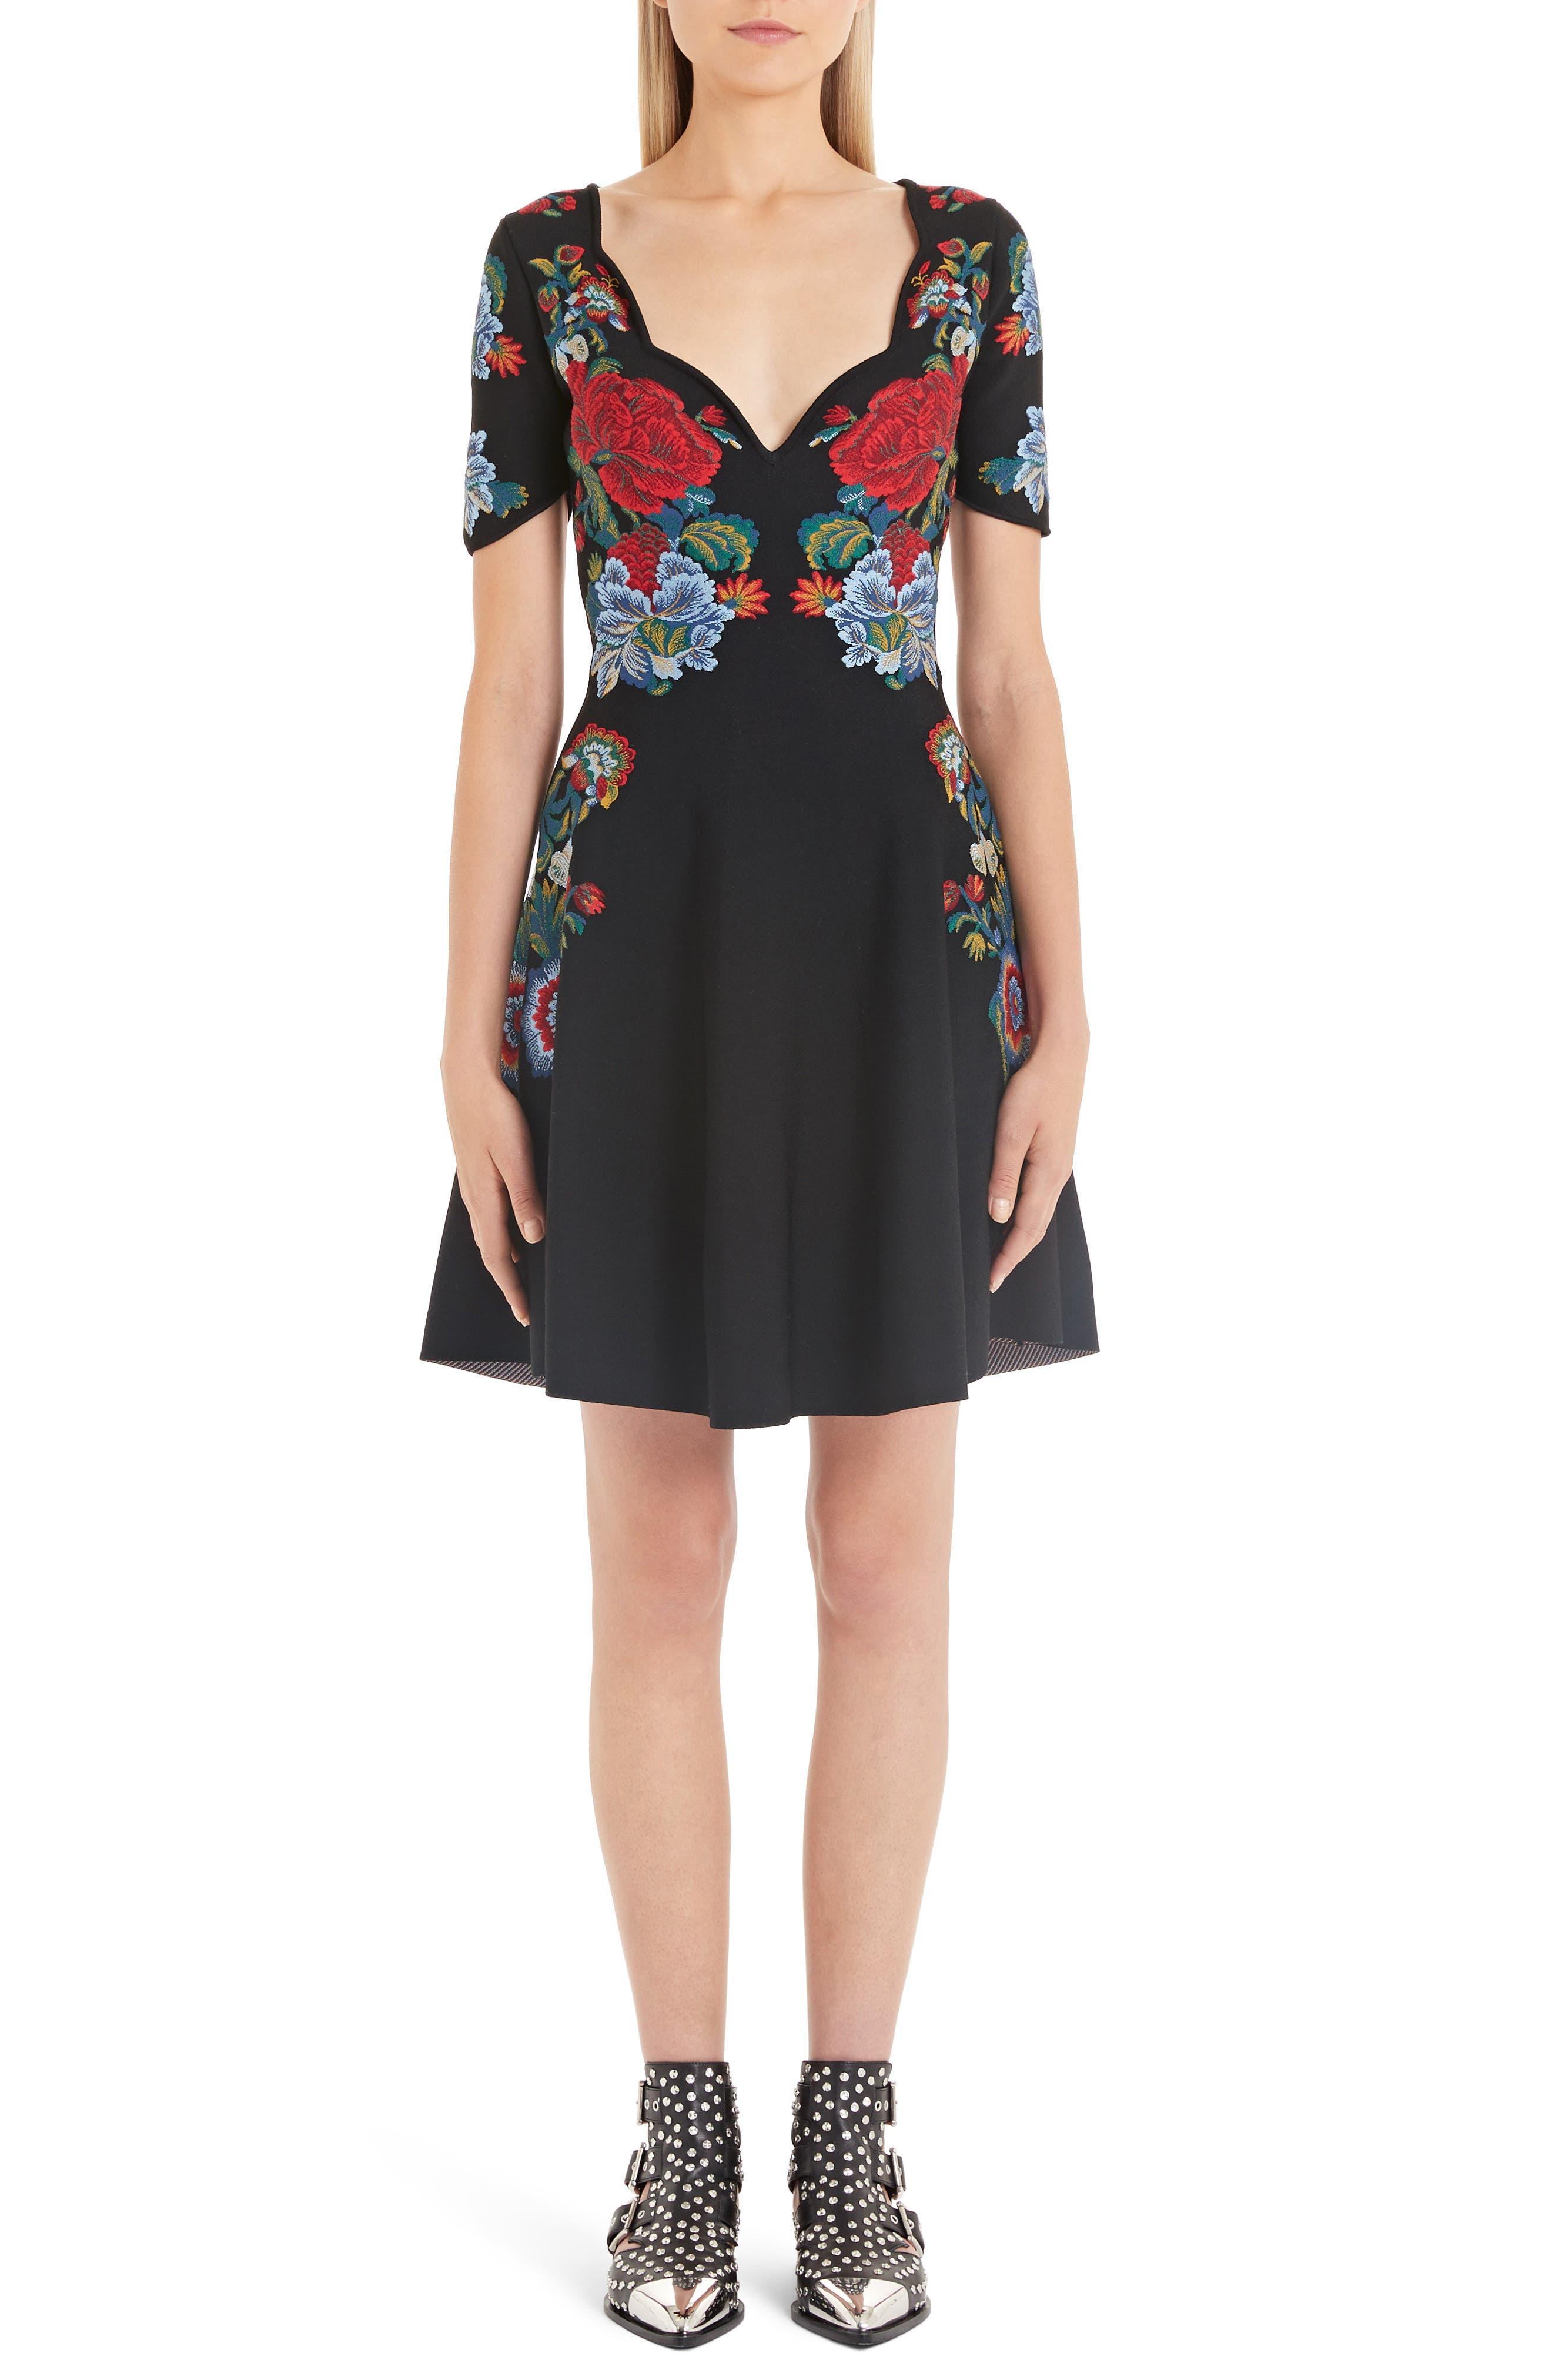 Alexander Mcqueen Floral Jacquard Fit & Flare Sweater Dress, Black